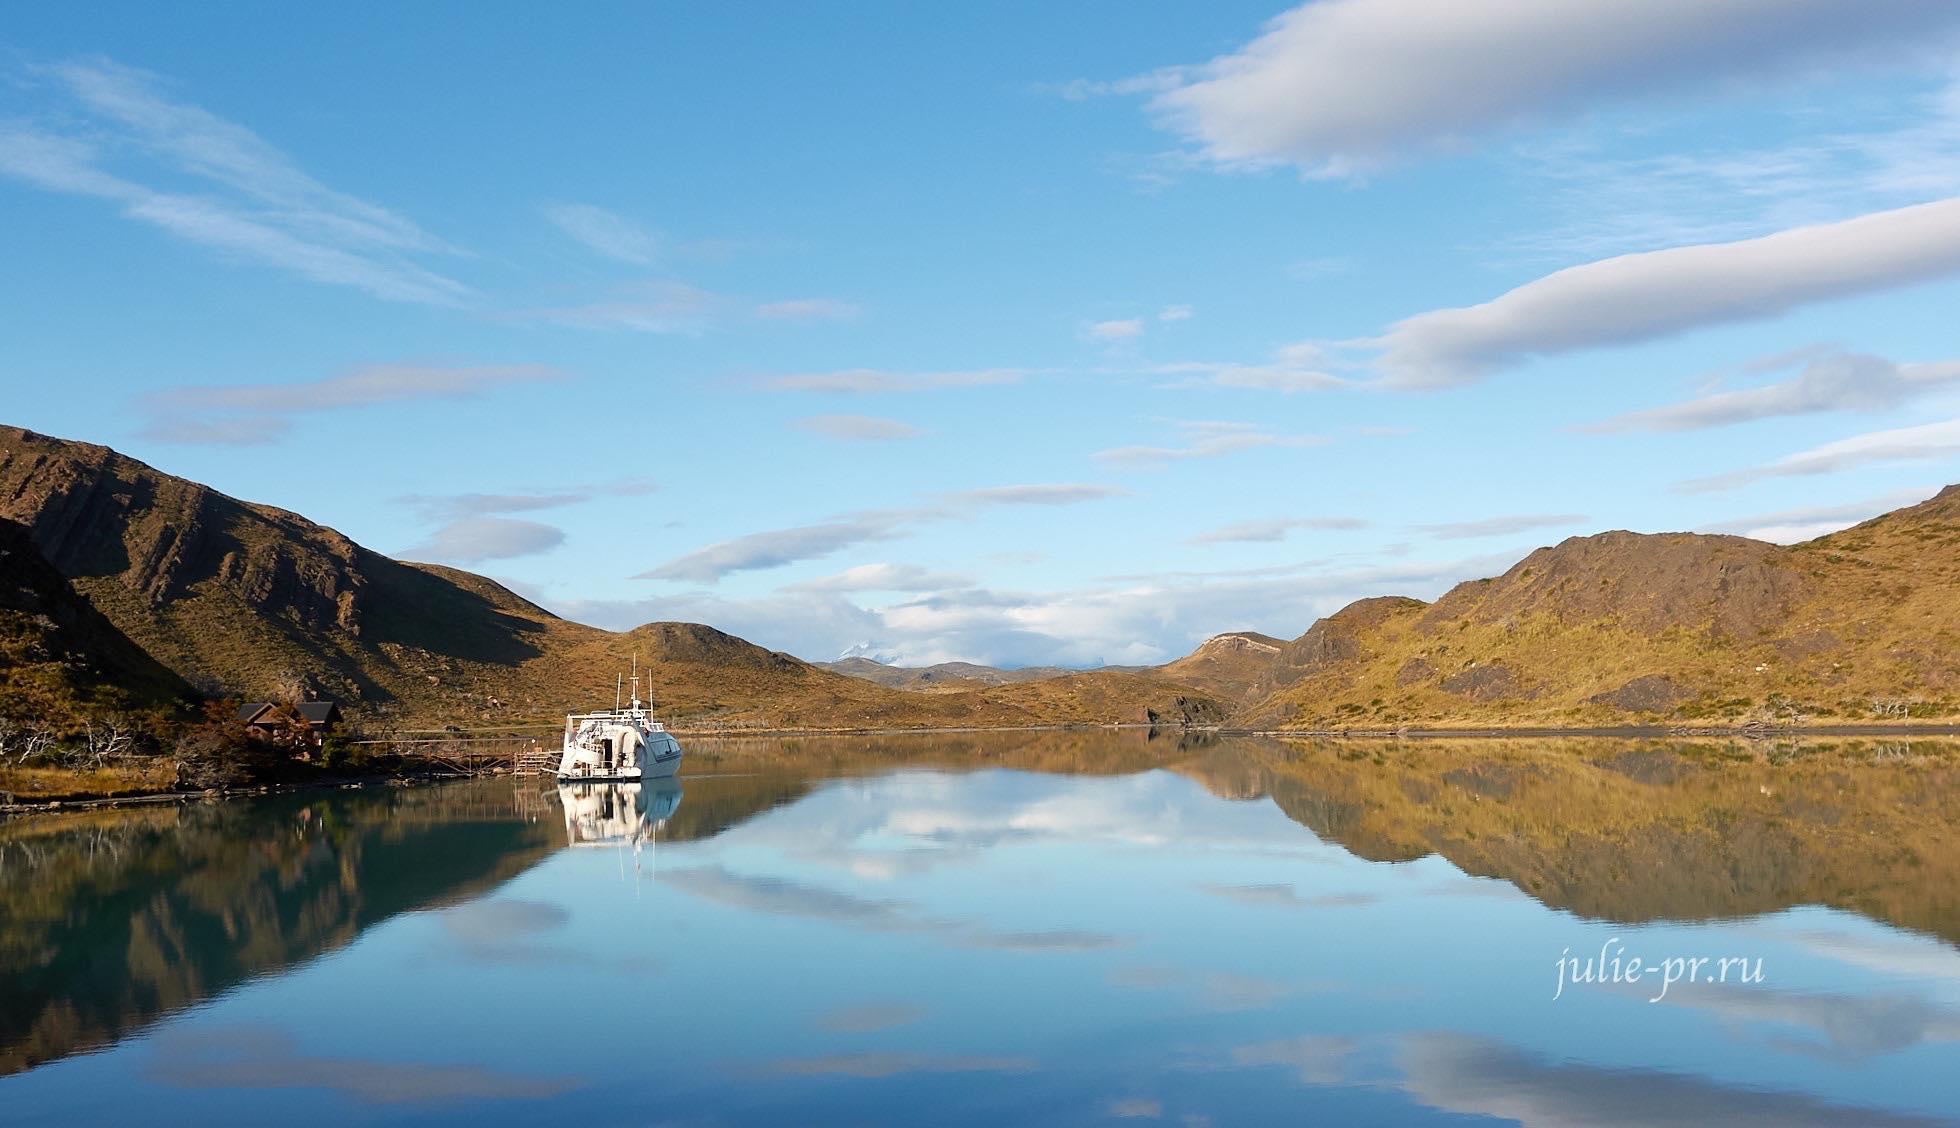 Чили, Патагония, Торрес-дель-Пайне, катер катамаран на озере Пеоэ